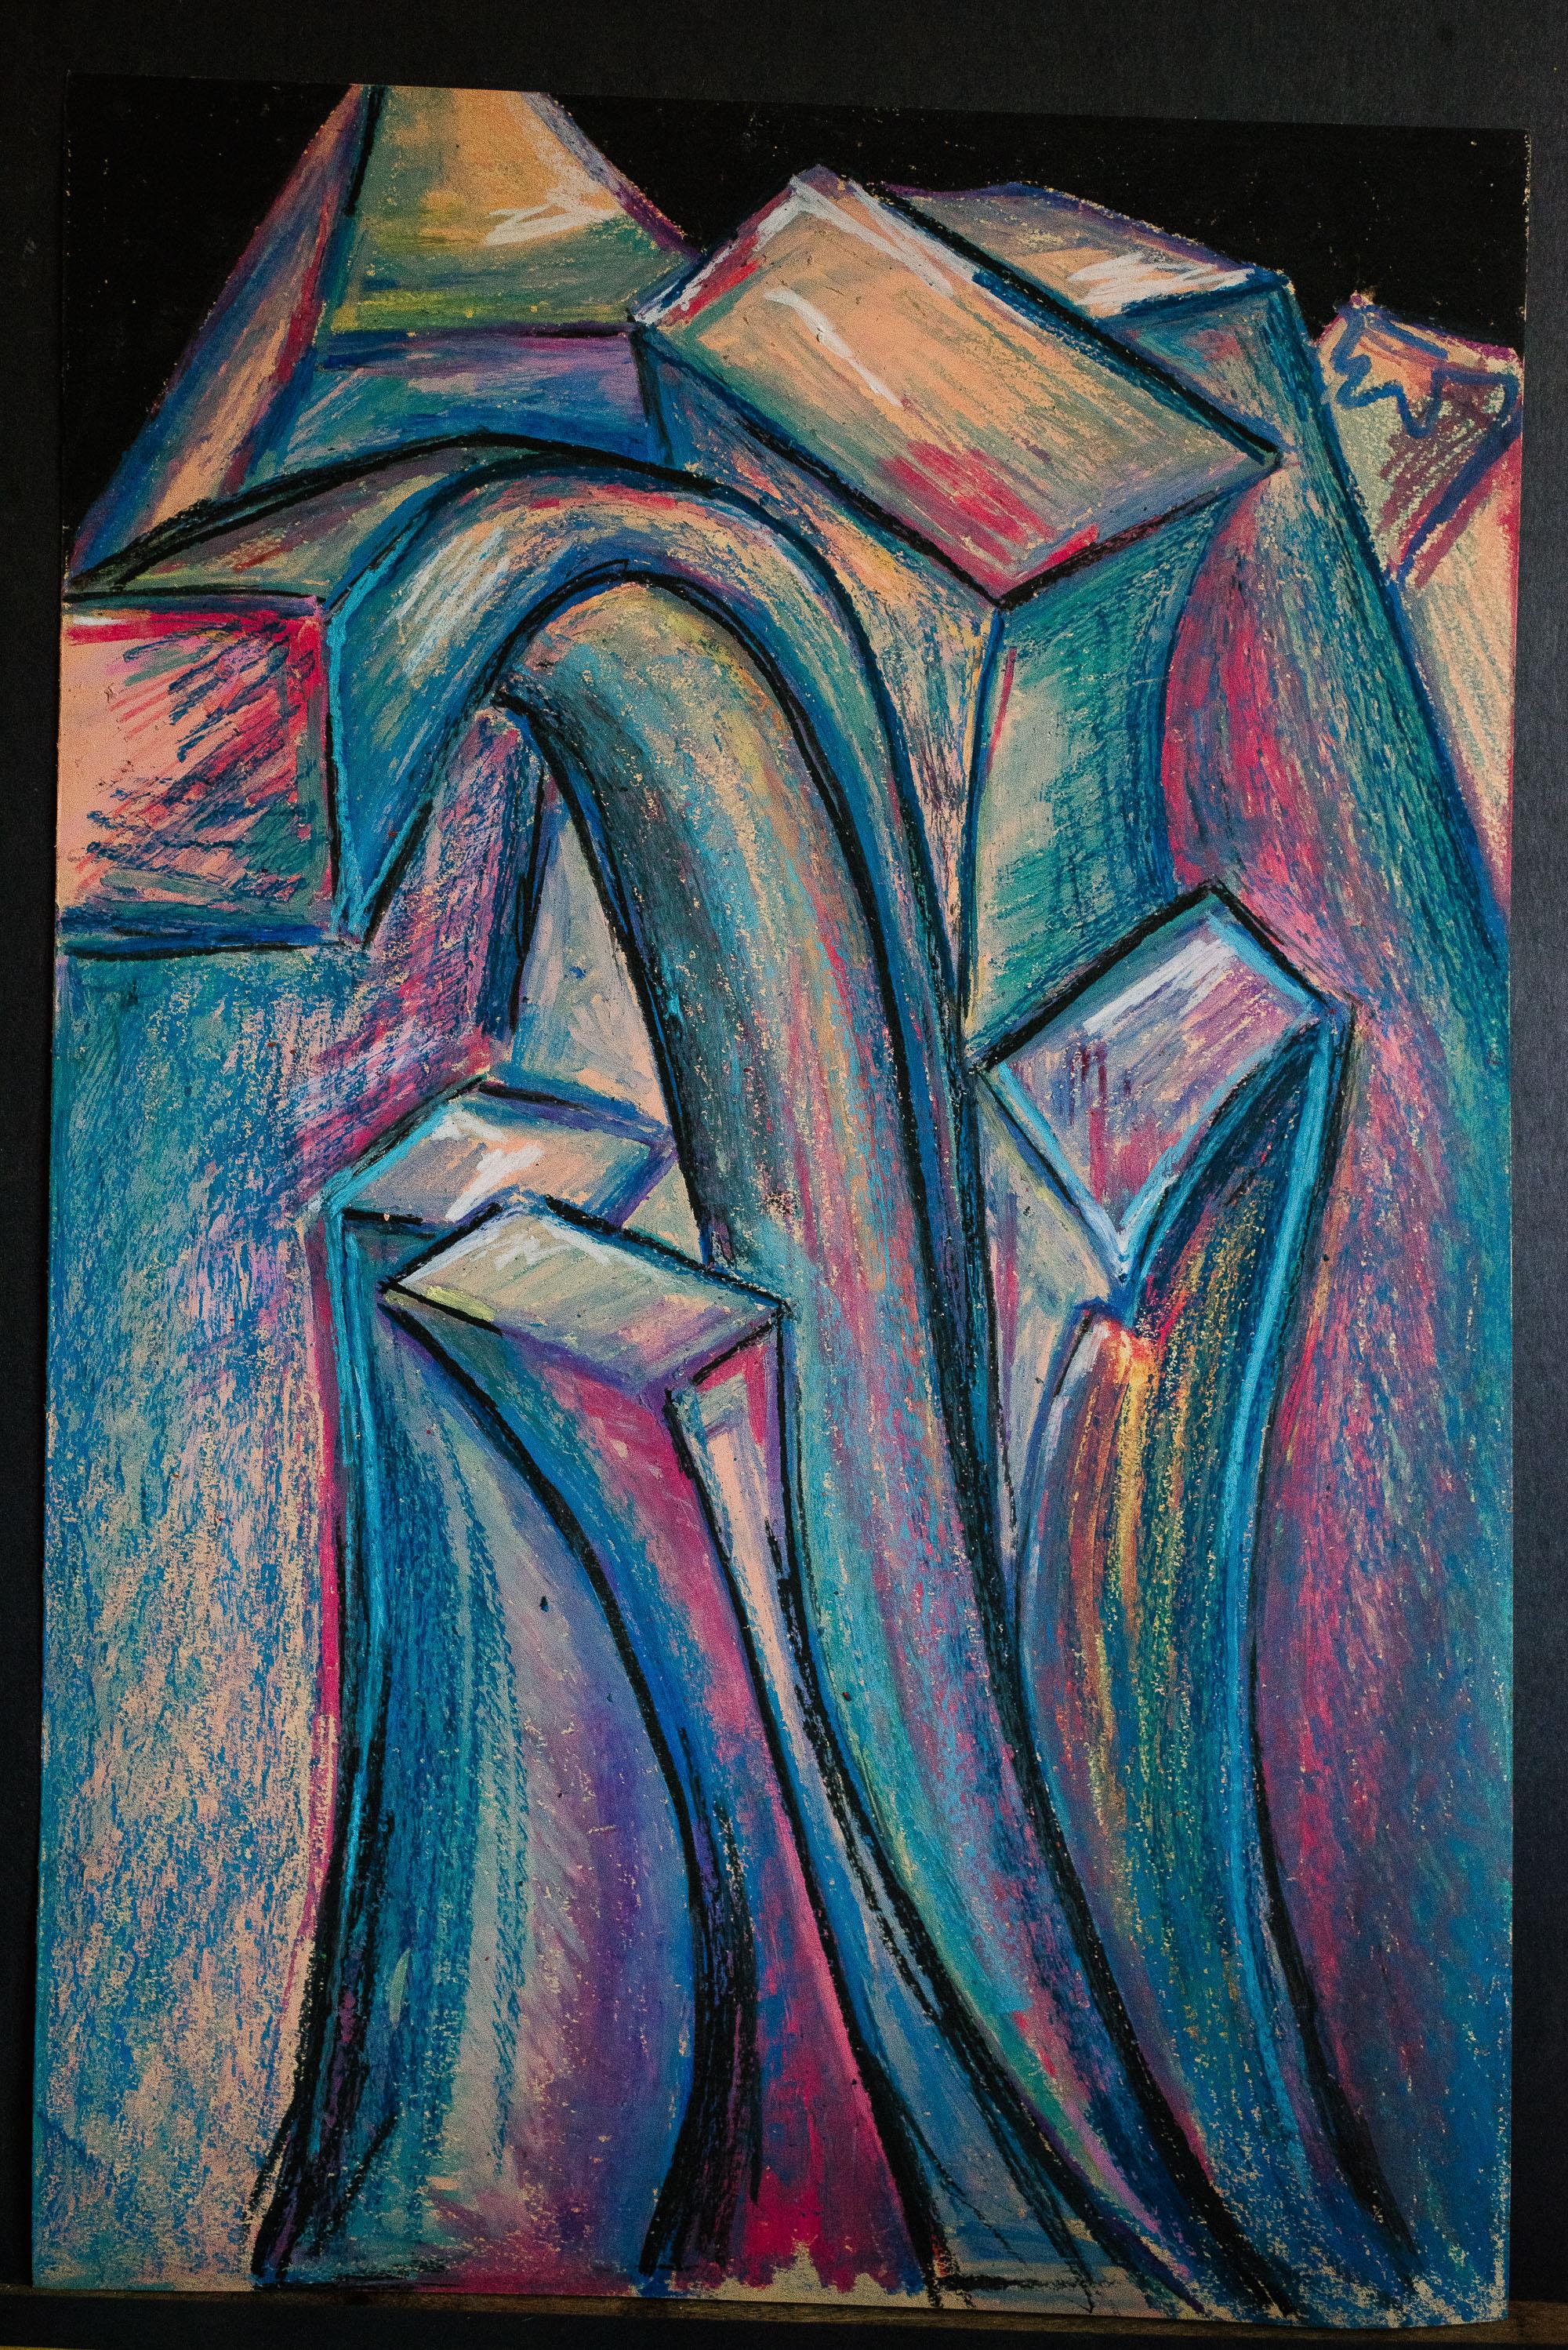 twisting tall purple buildings ap art viara mileva